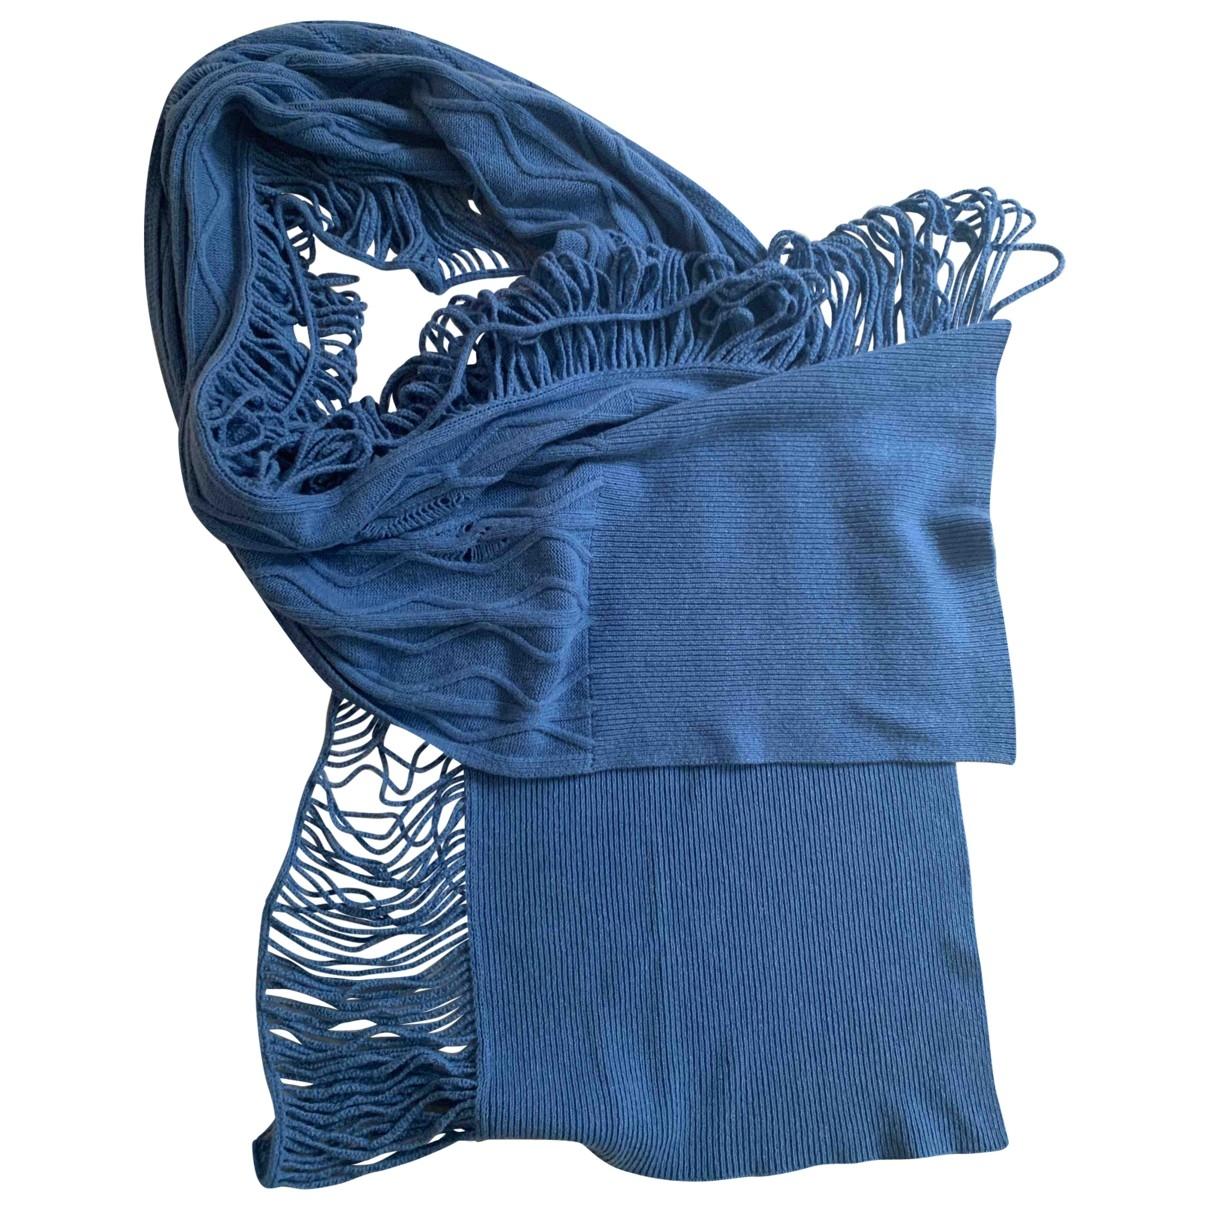 Stella Mccartney - Foulard   pour femme en cachemire - bleu